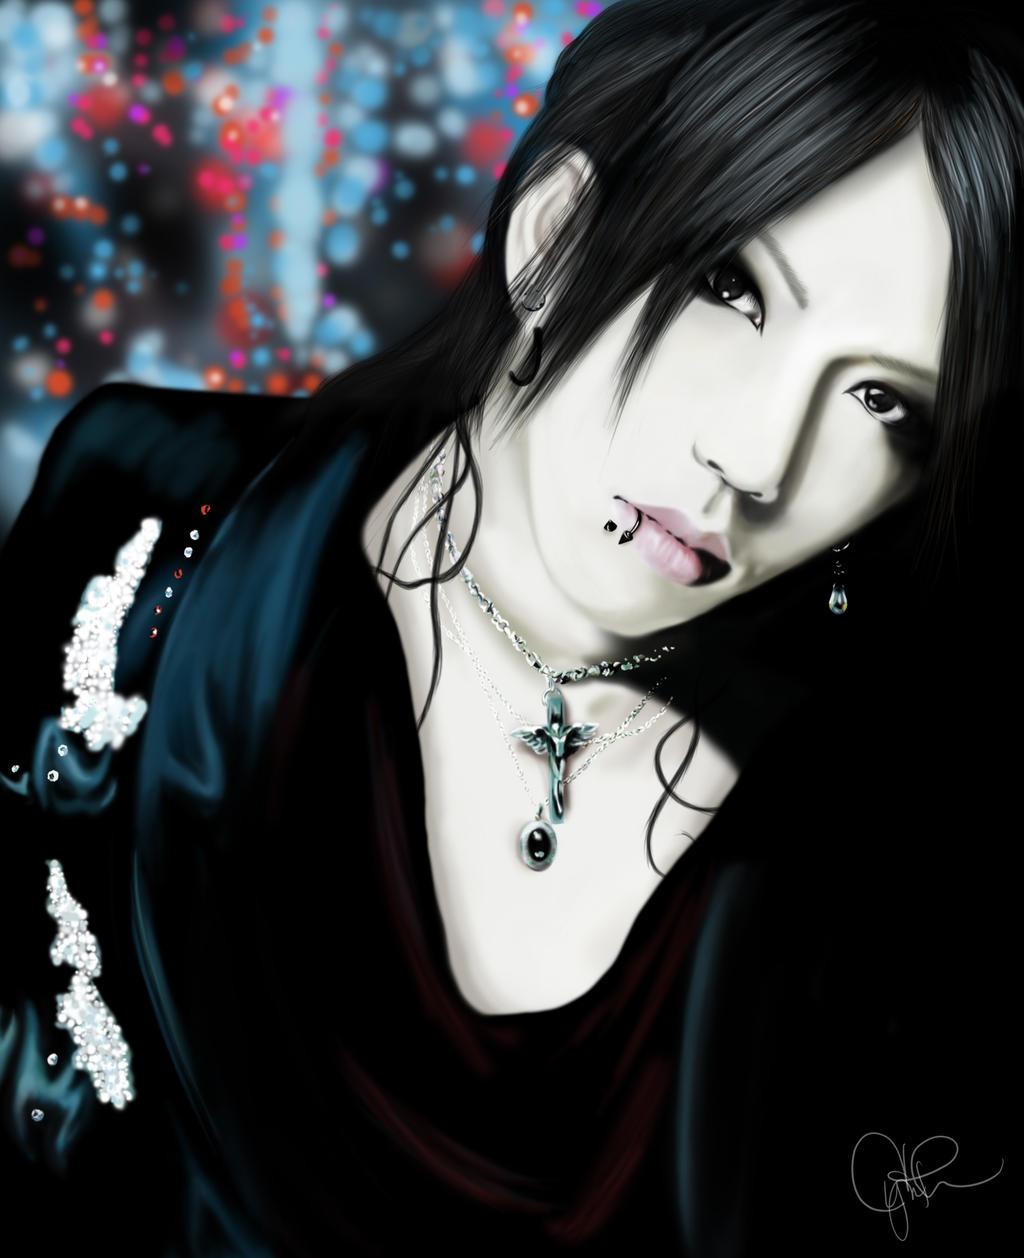 Gazette Aoi Neo Genesis 10 By Yukari Sama On Deviantart